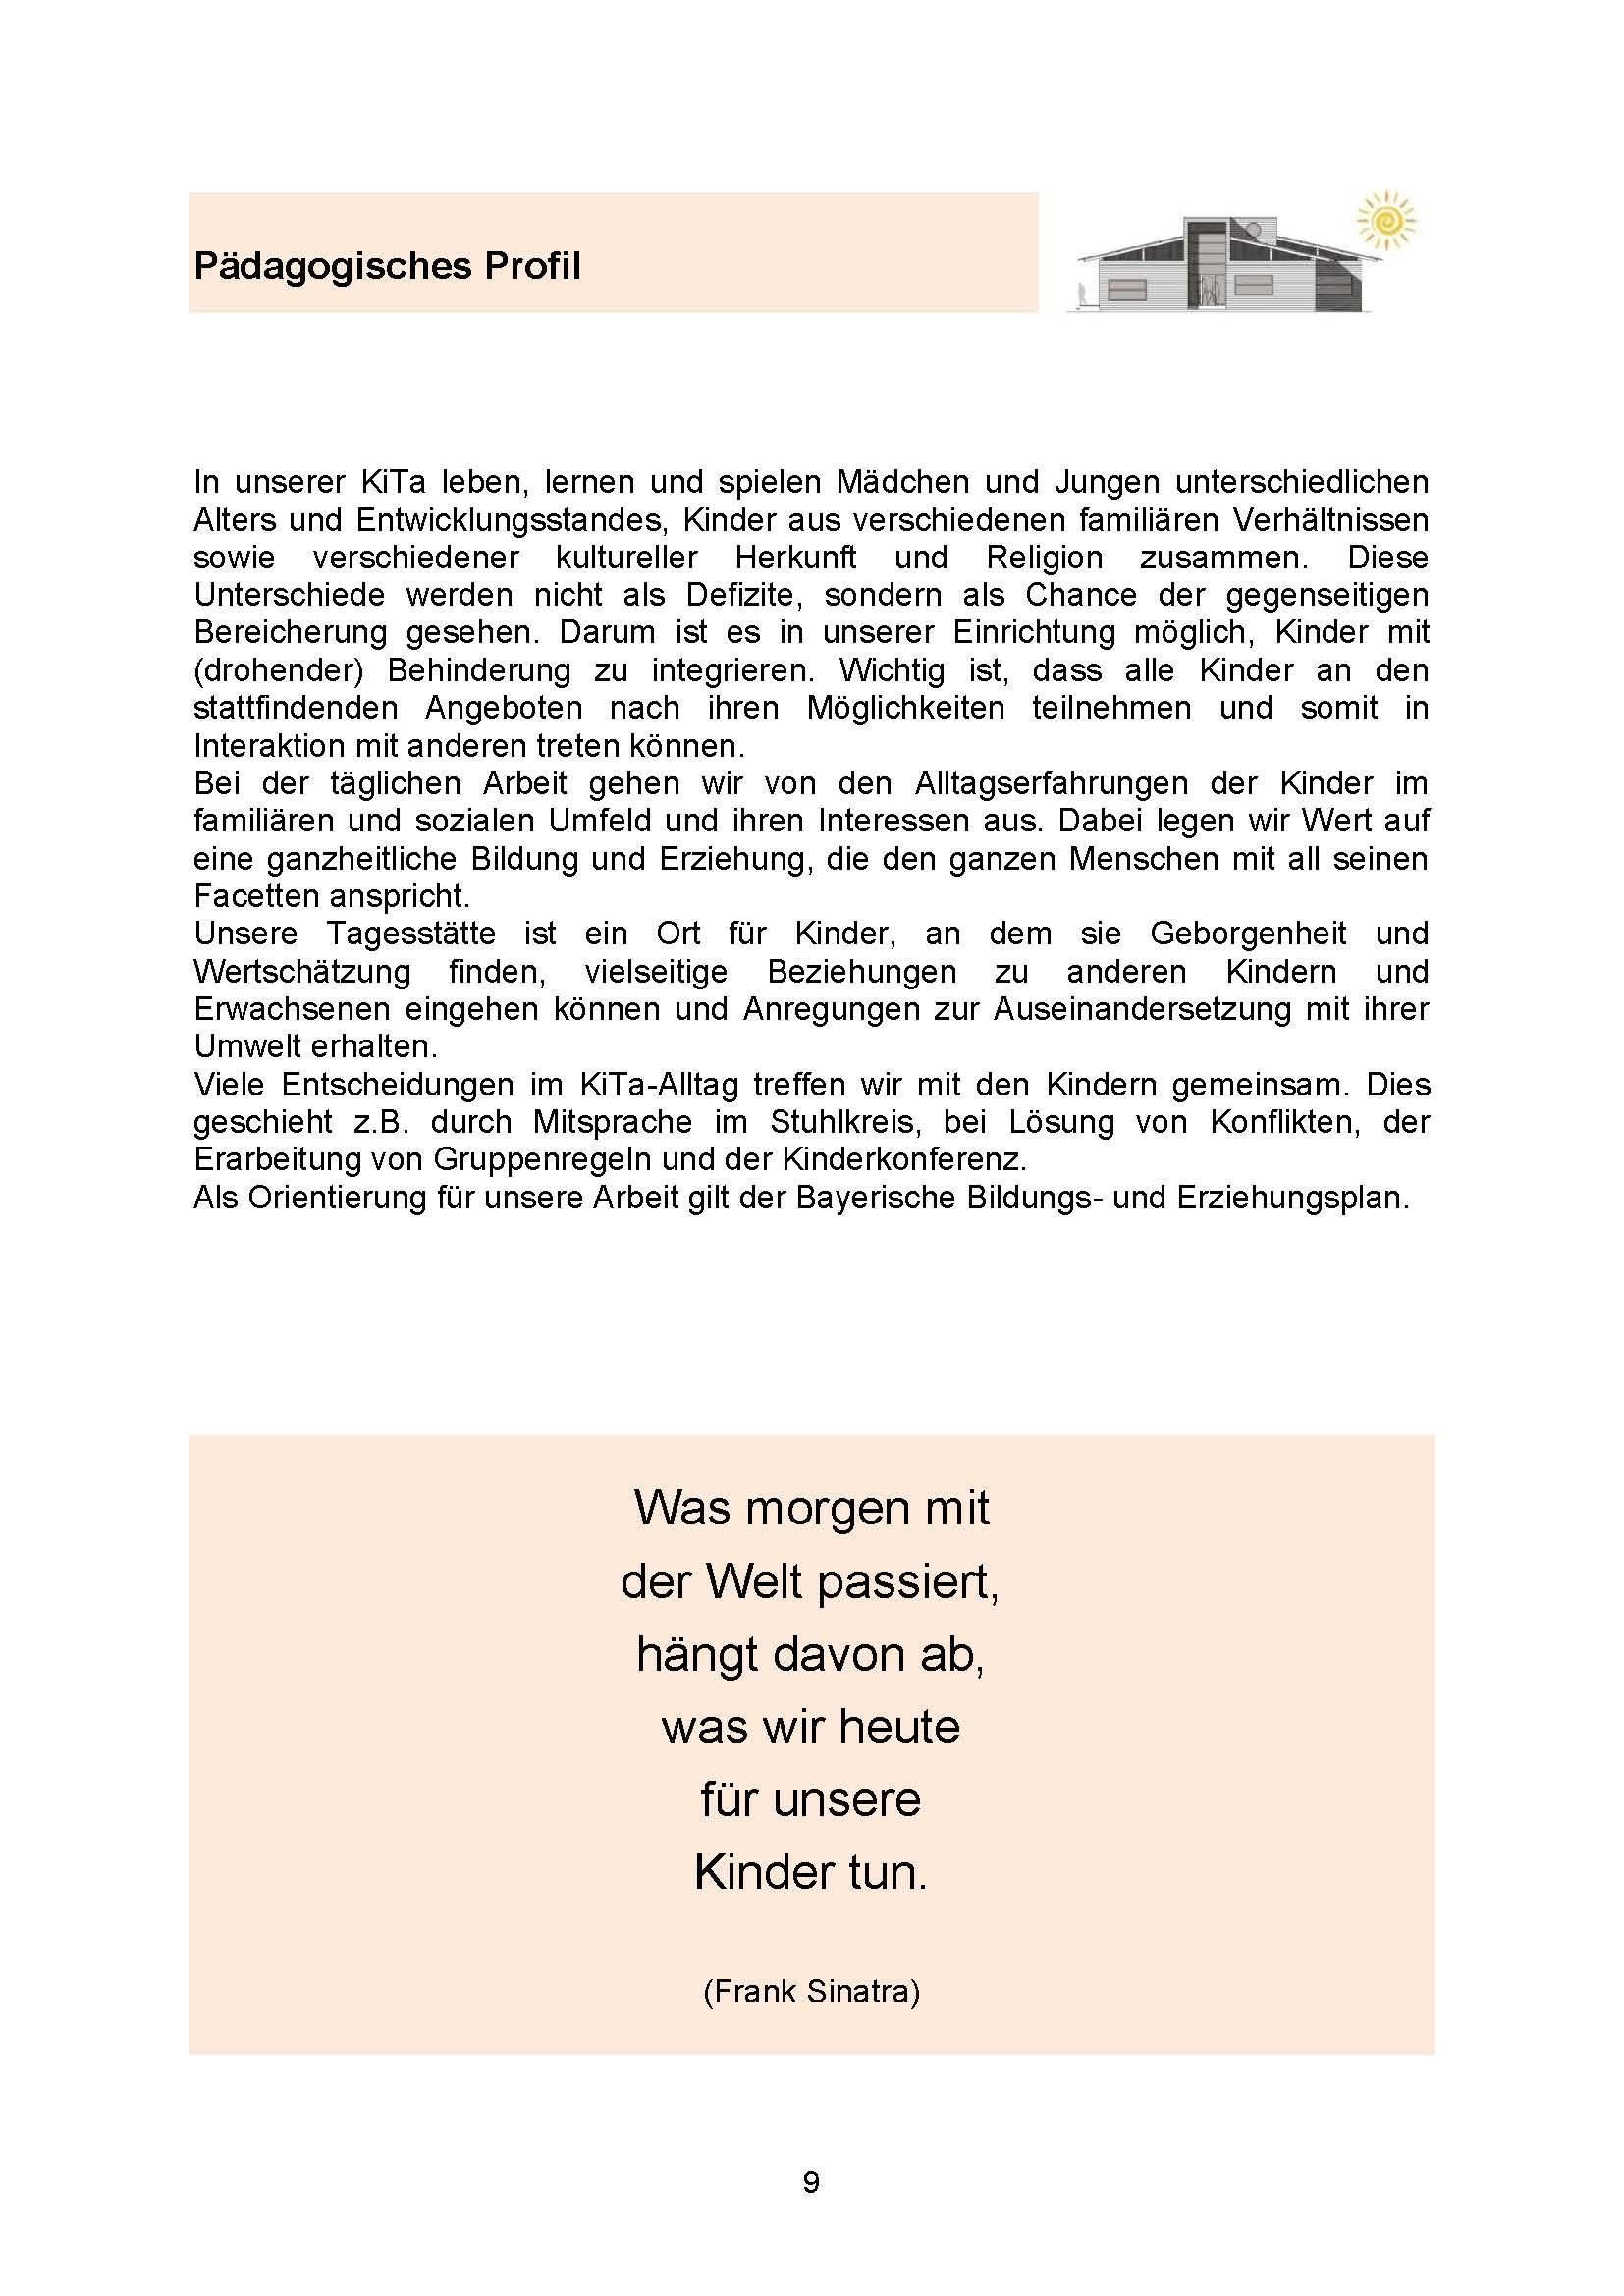 Seite 9 Päd. Profil